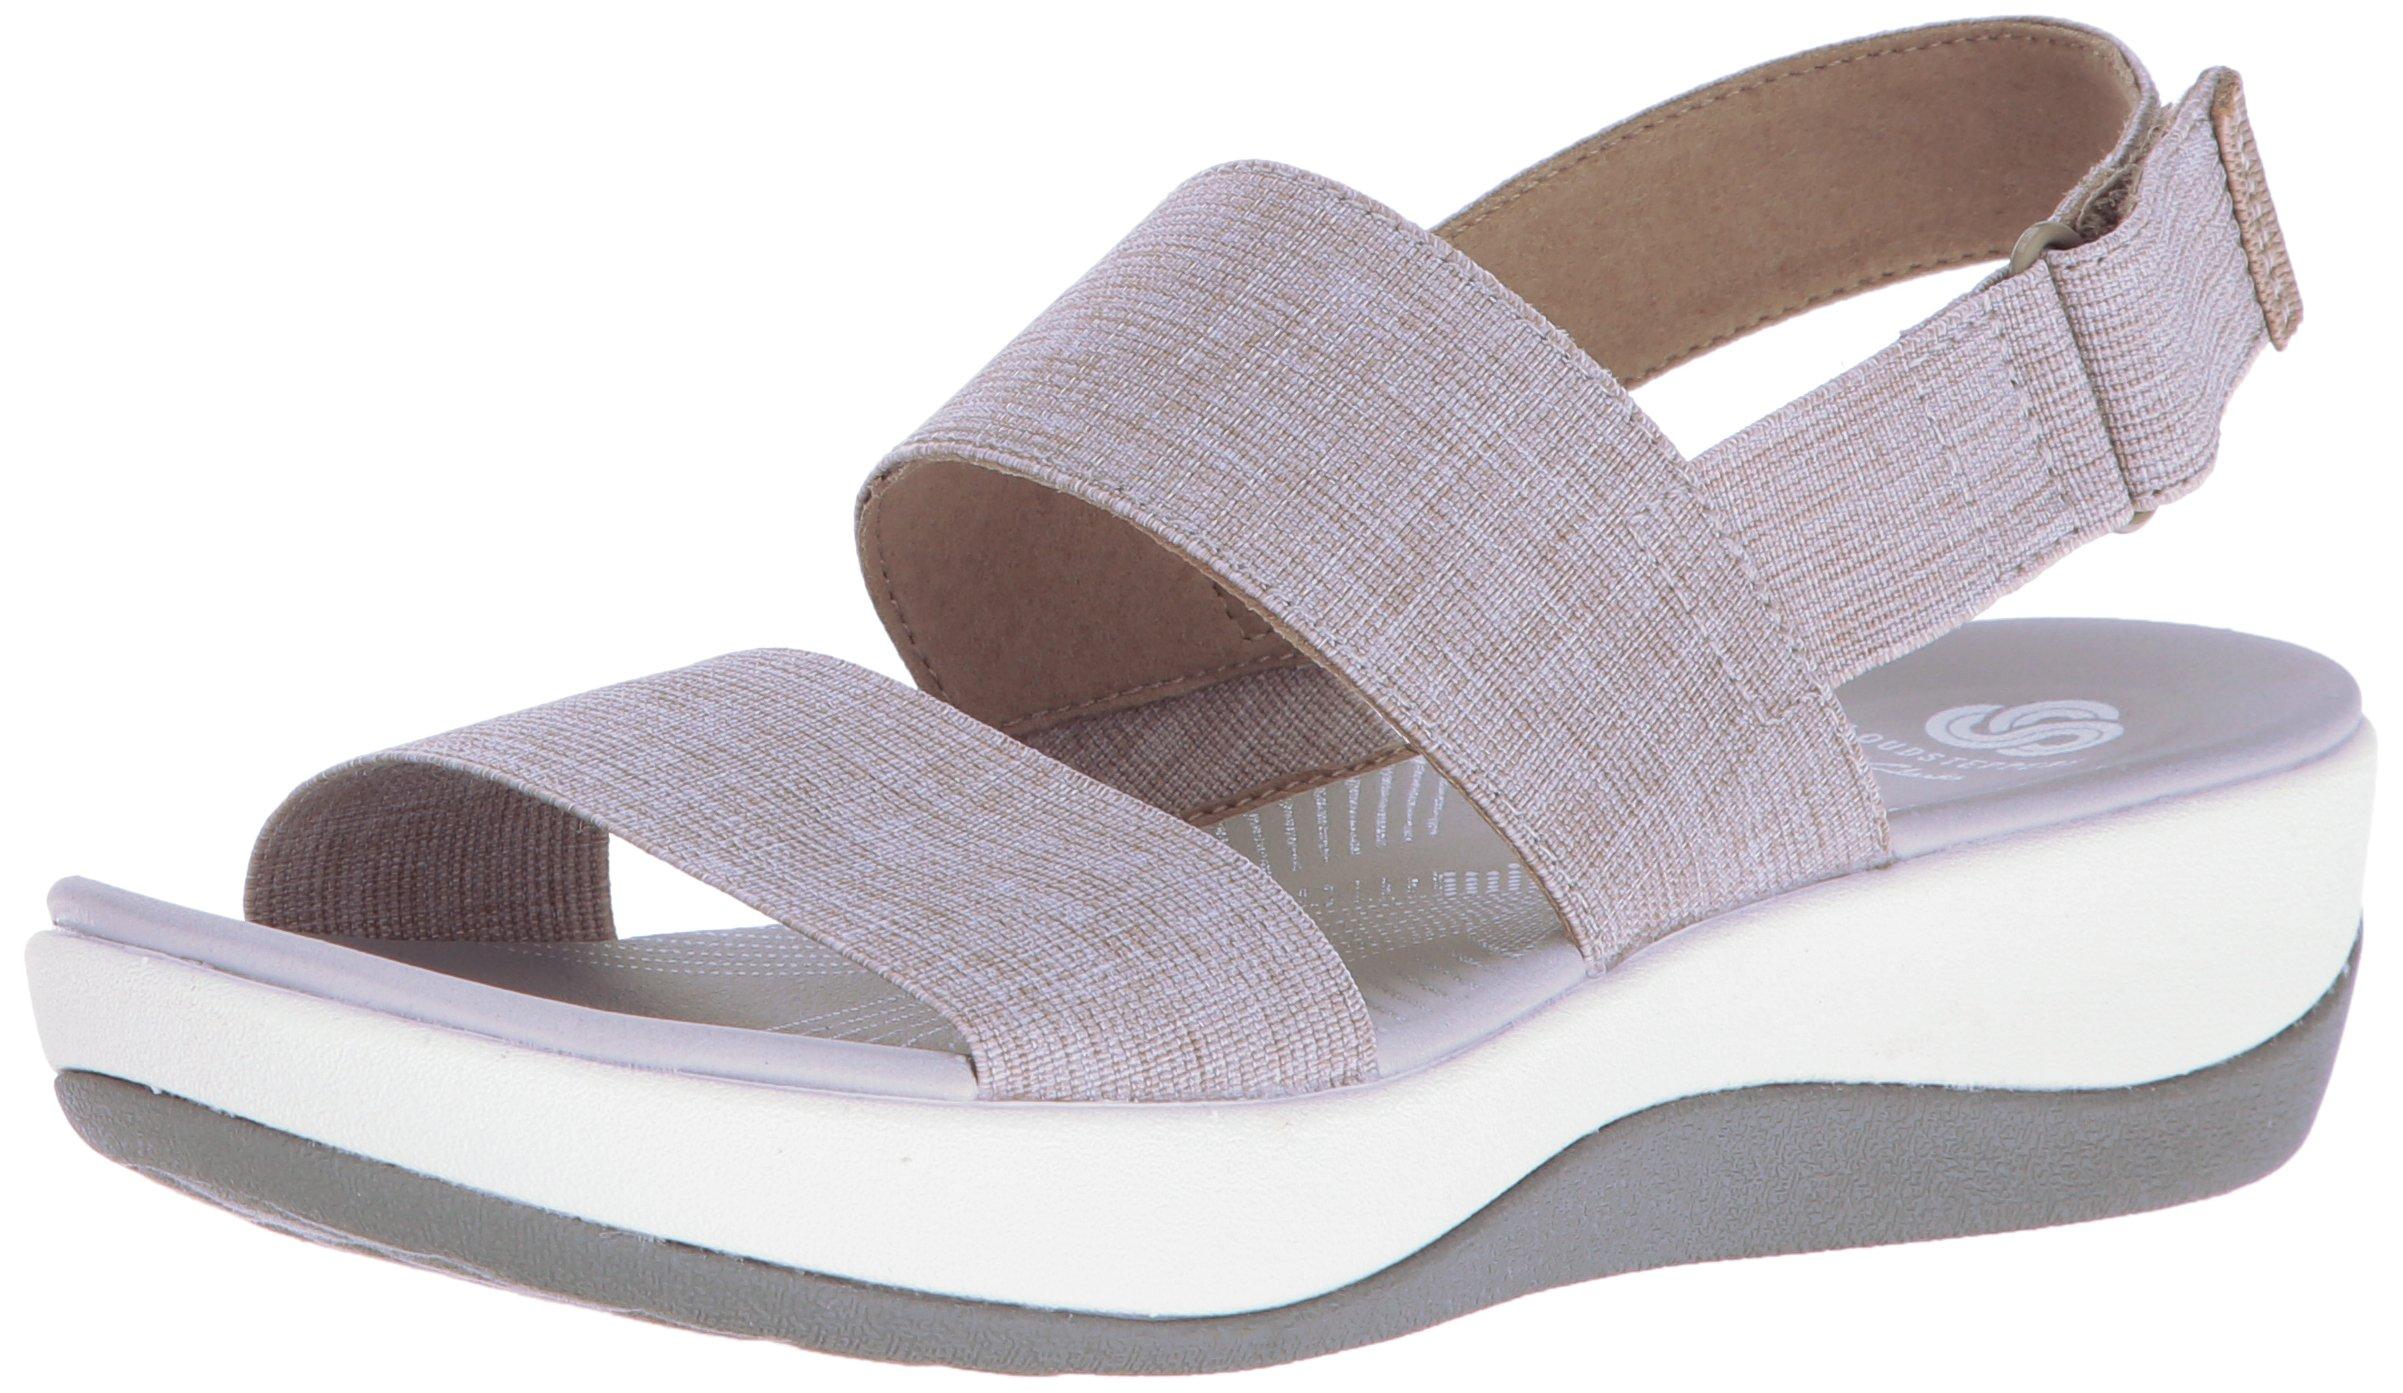 CLARKS Womens Jacory Wedge Sandal